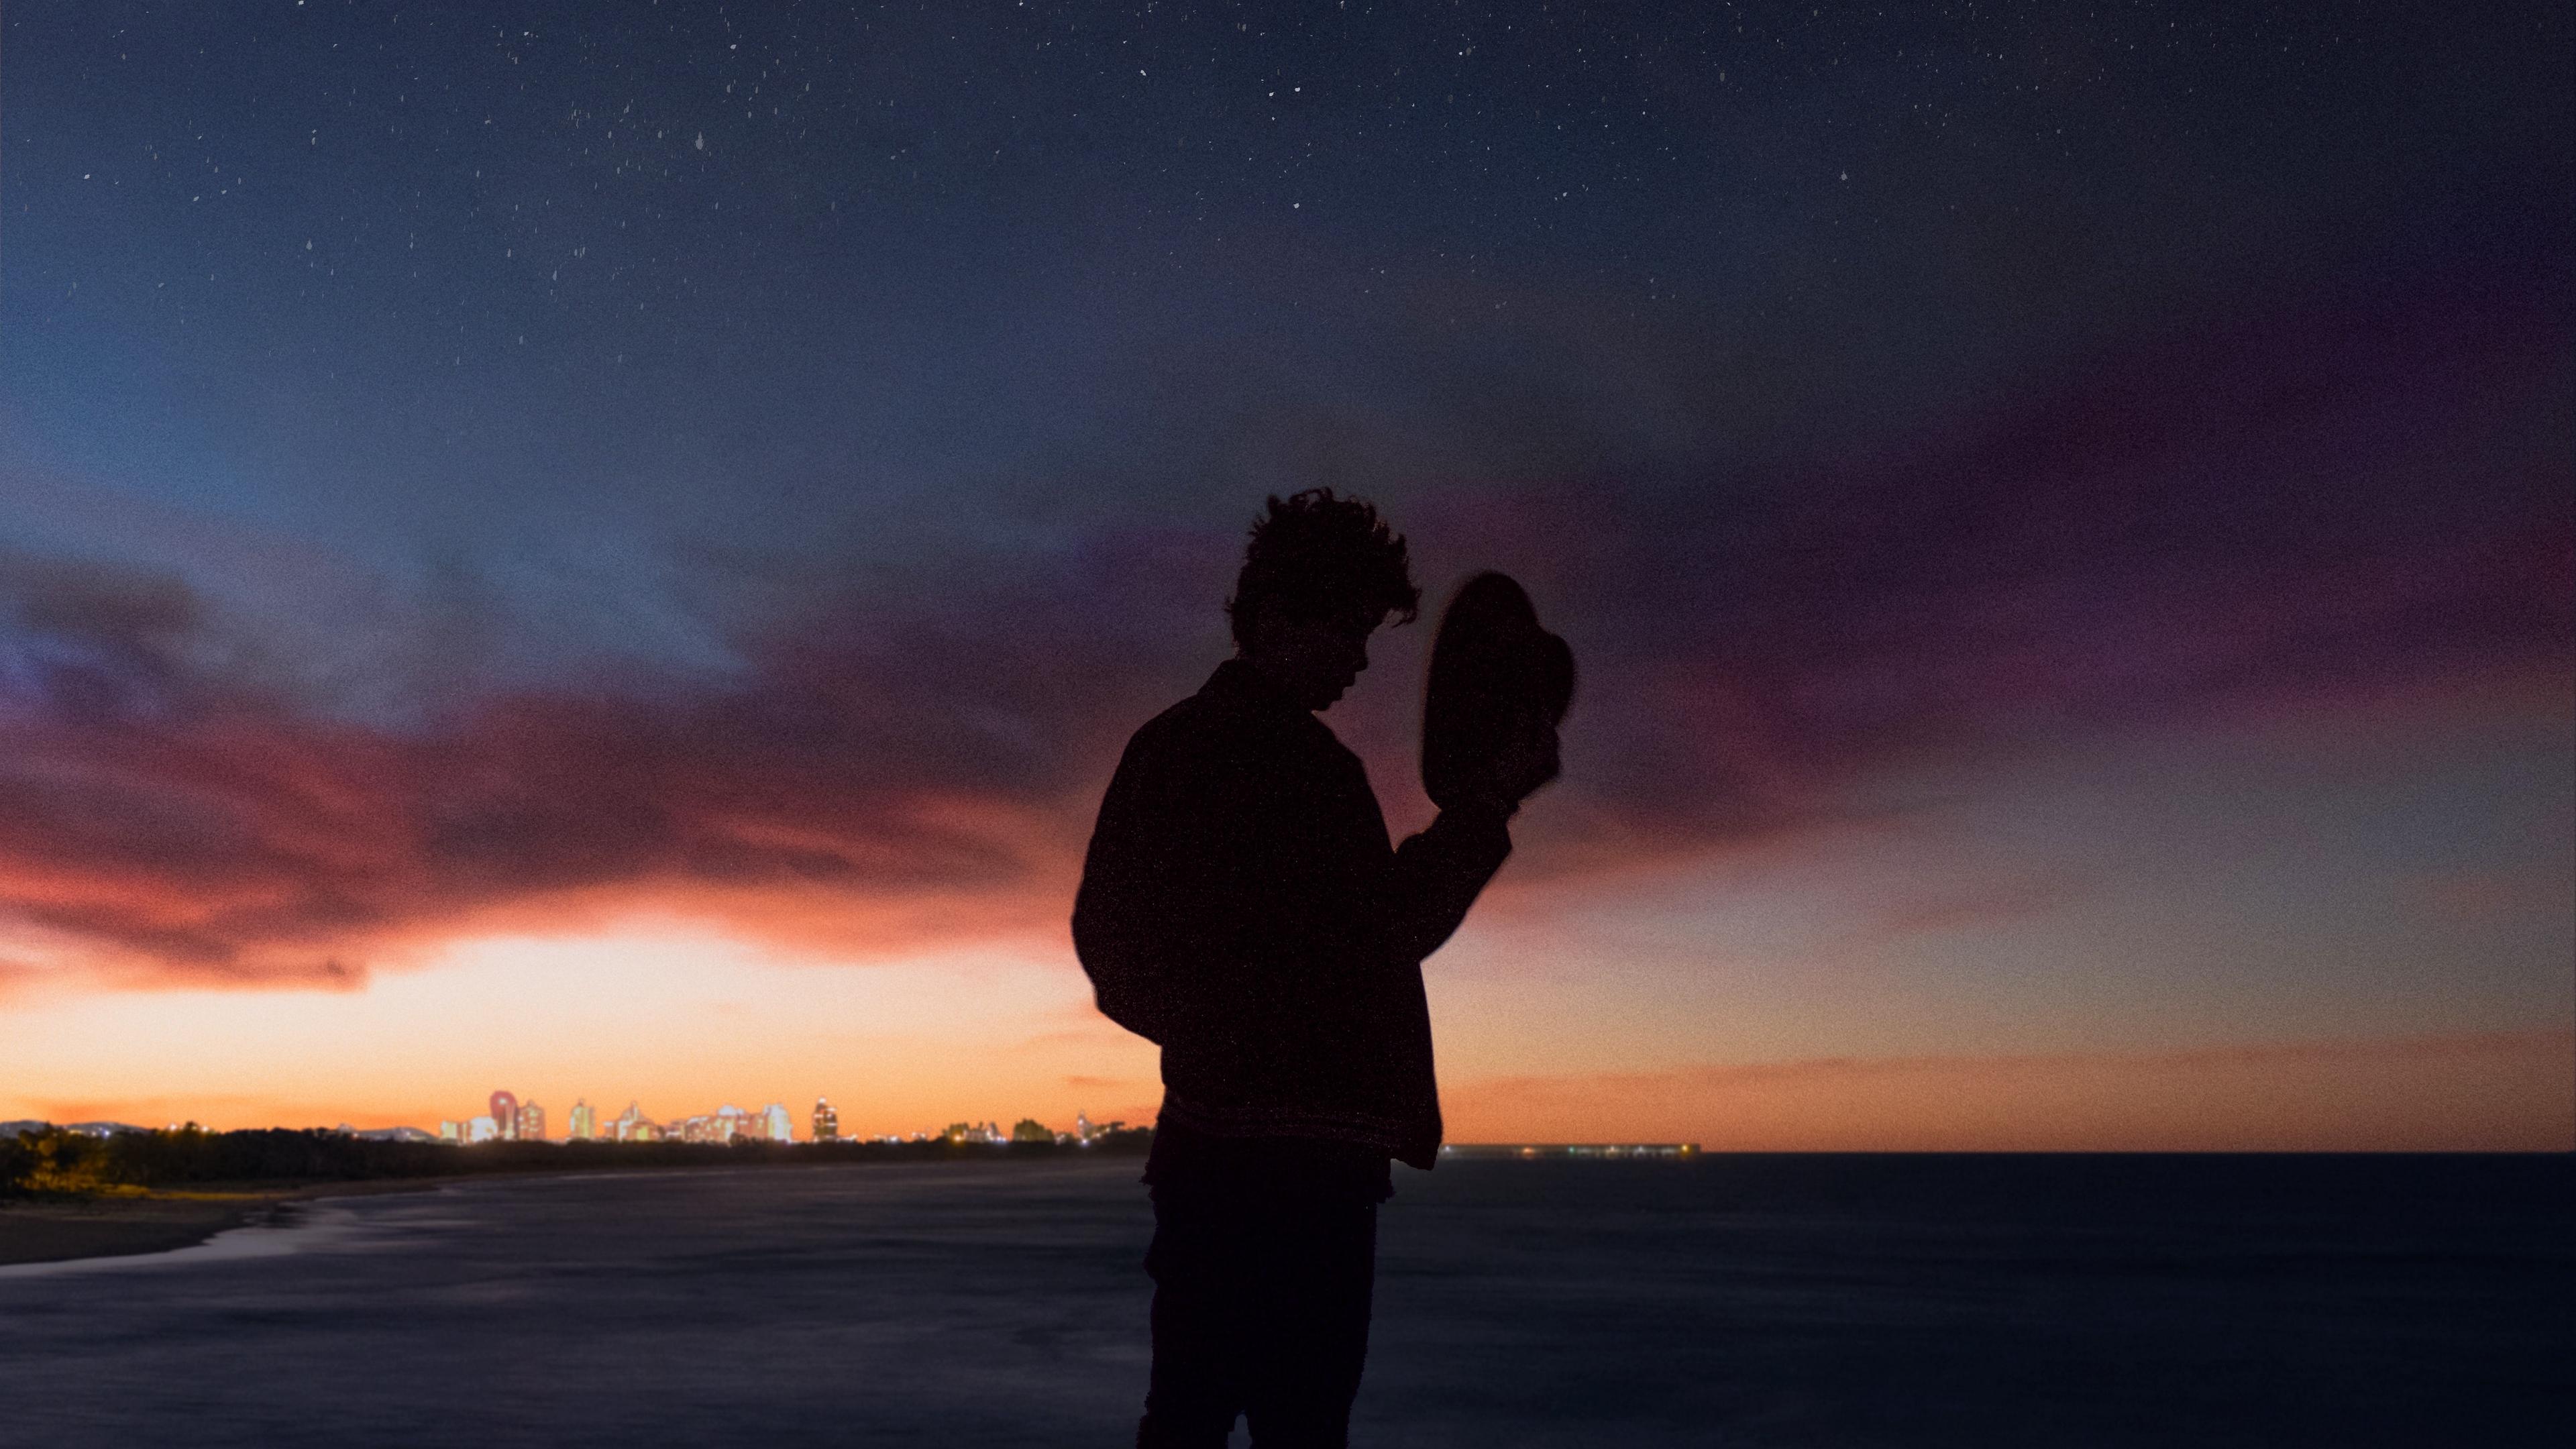 starry sky silhouette alone solitude hat horizon 4k 1540576332 - starry sky, silhouette, alone, solitude, hat, horizon 4k - starry sky, Silhouette, Alone